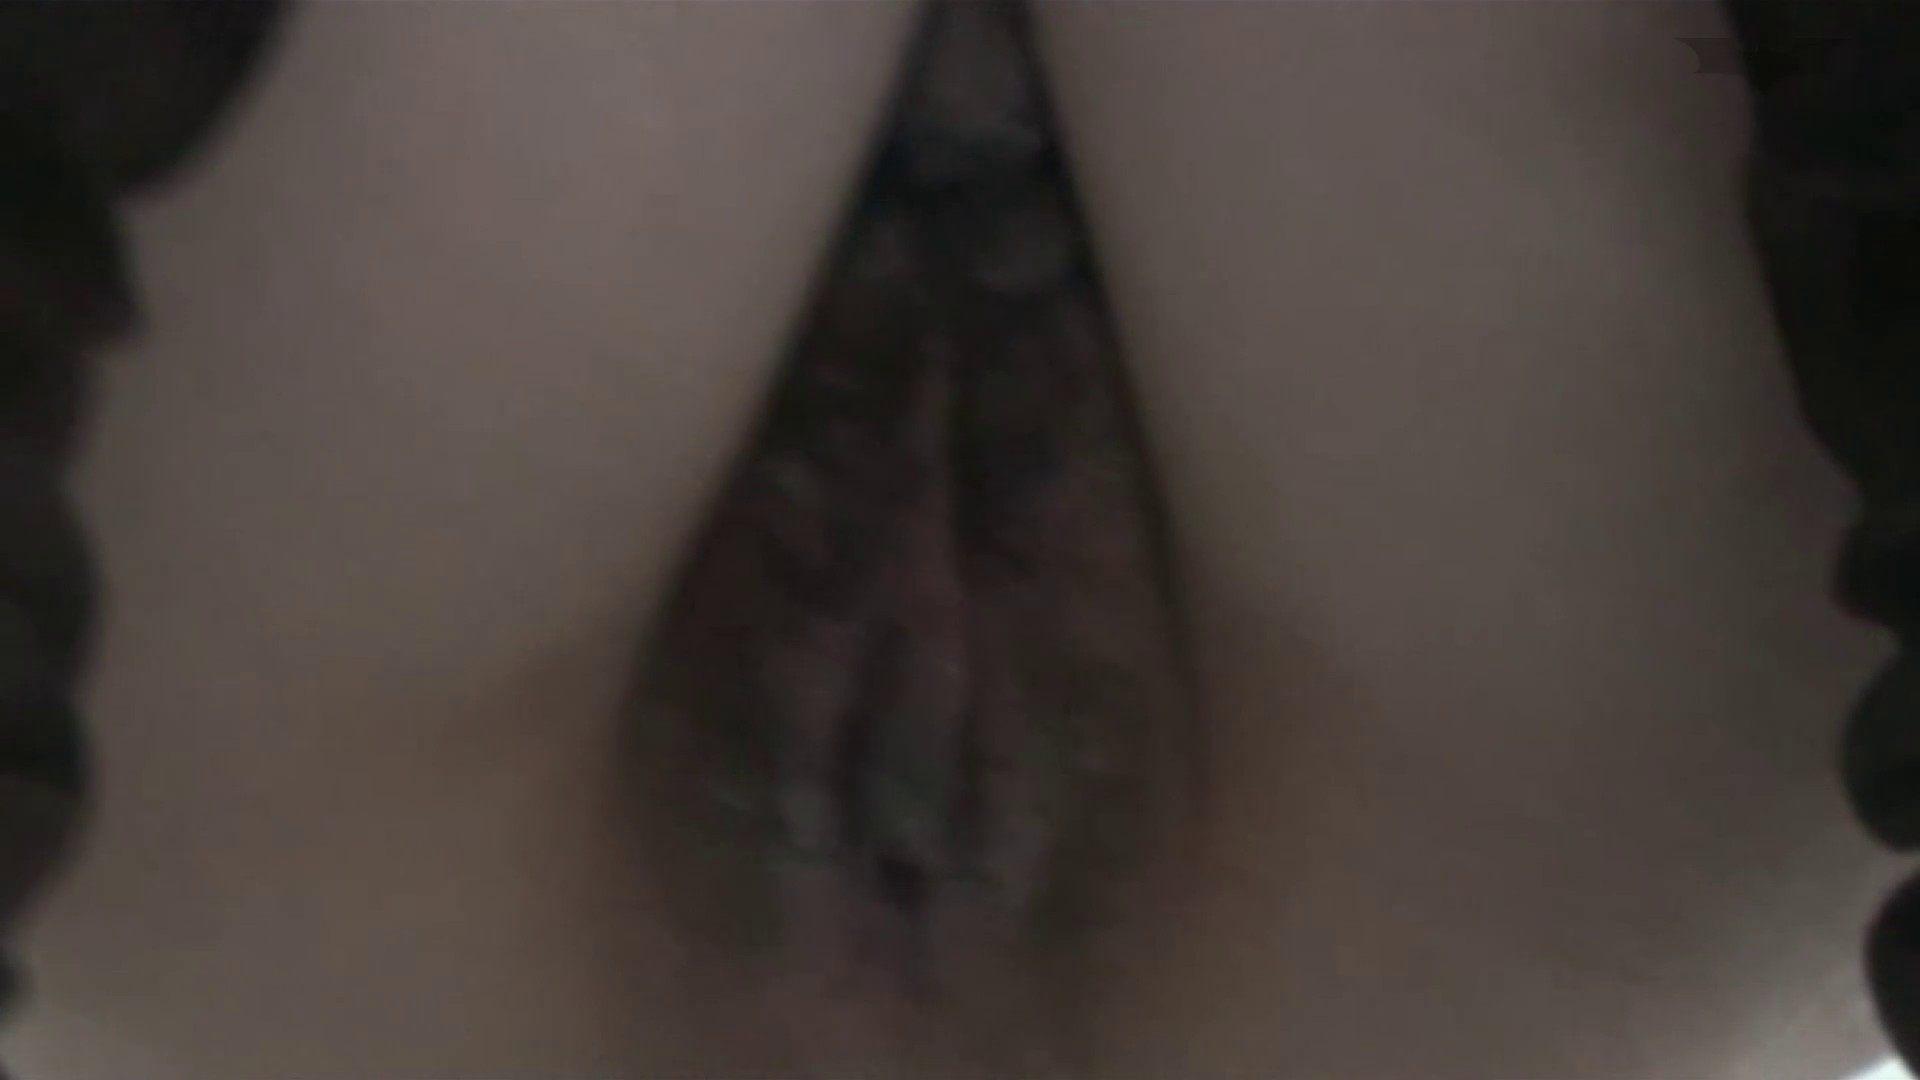 JD盗撮 美女の洗面所の秘密 Vol.46 細身女性 スケベ動画紹介 99画像 12